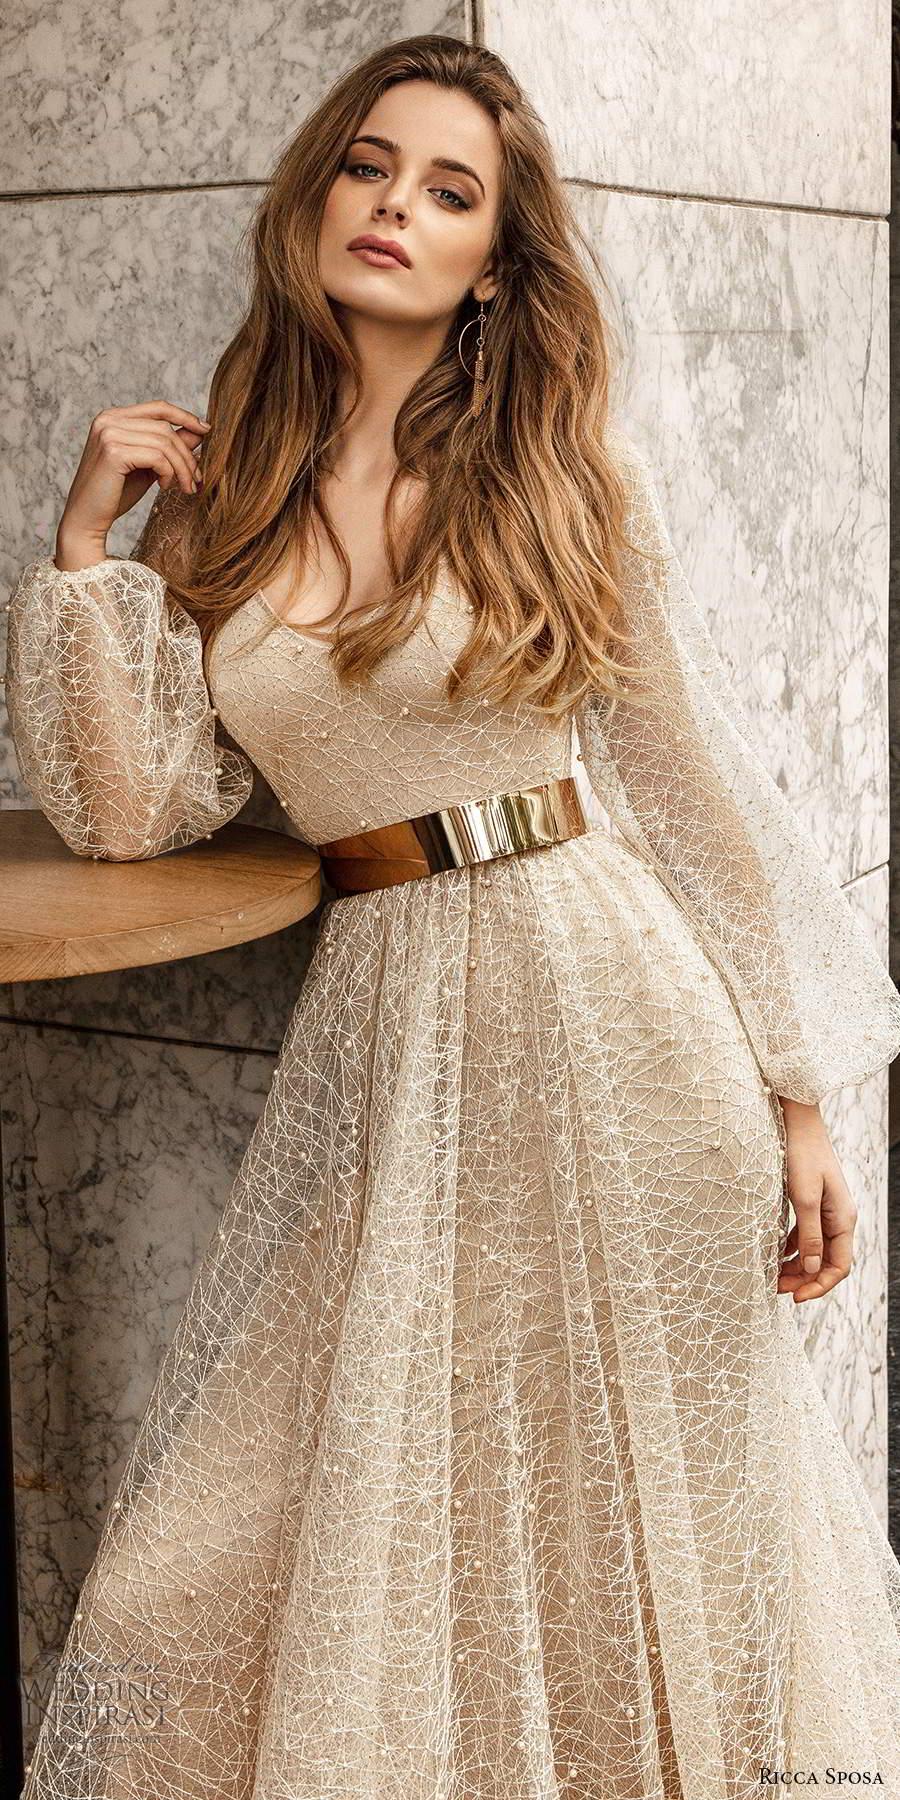 ricca sposa 2020 barcelona bridal sheer bishop sleeves scoop neckline fully embellished glitzy glam a line wedding dress metallic gold belt chapel train (12) mv